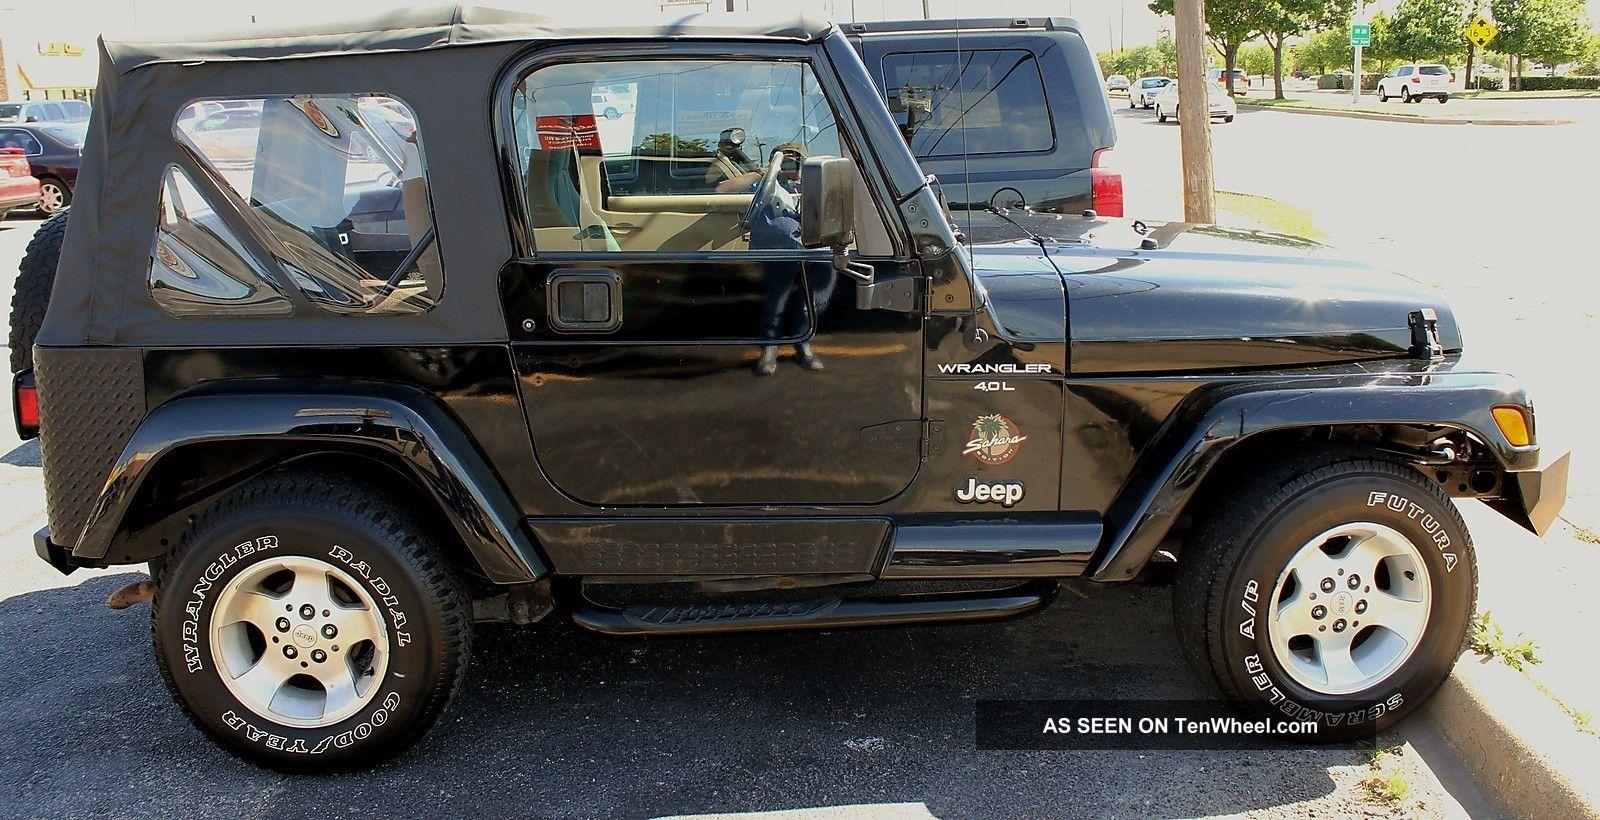 2001 jeep wrangler sahara 4wd. Black Bedroom Furniture Sets. Home Design Ideas